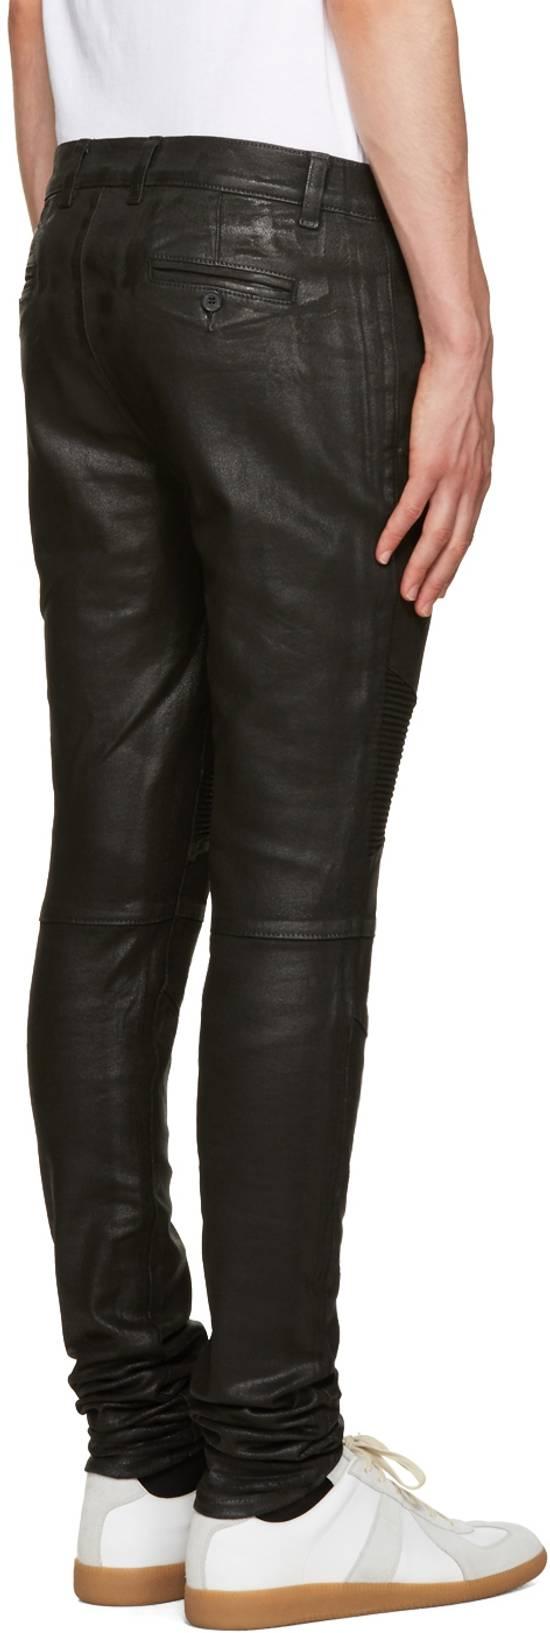 Balmain 1265$ Skinny Coated Stretch Denim Biker Jeans Size US 27 - 2